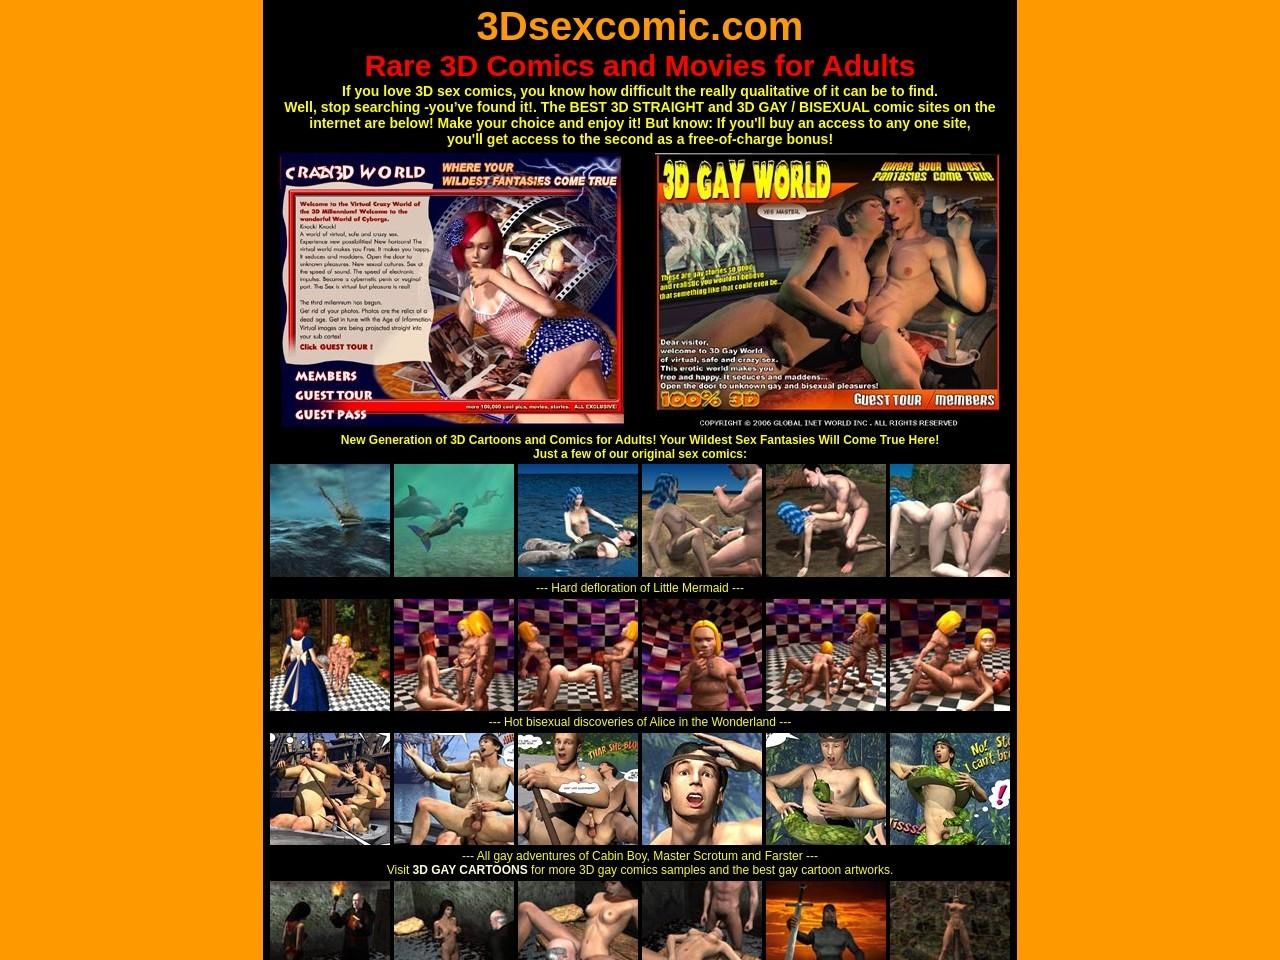 Free Webcam Videos & Private Premium Shows, Camgirl Videos